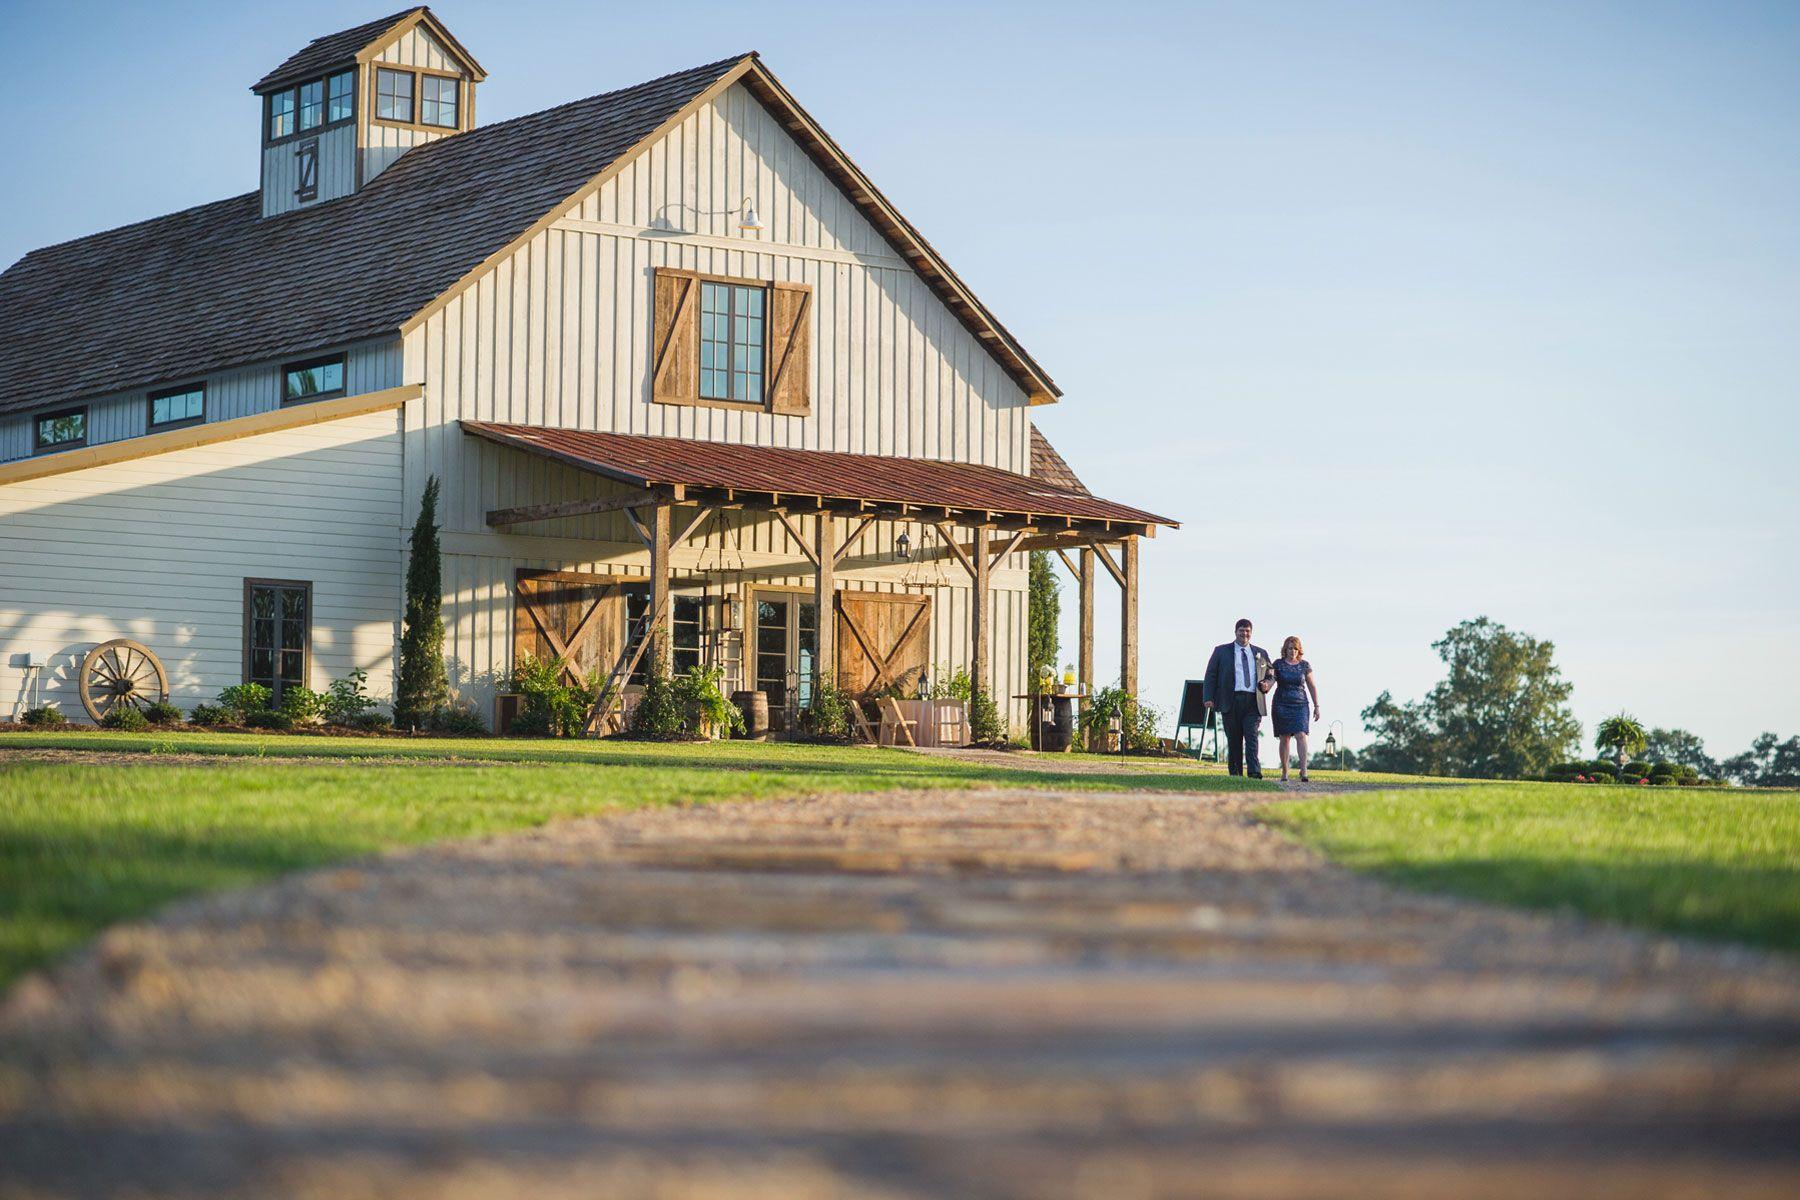 barn venue event center mississippi historic barns plans converted weddings houses venues pole modern bridlewood restorations heritage heritagebarns homes poll